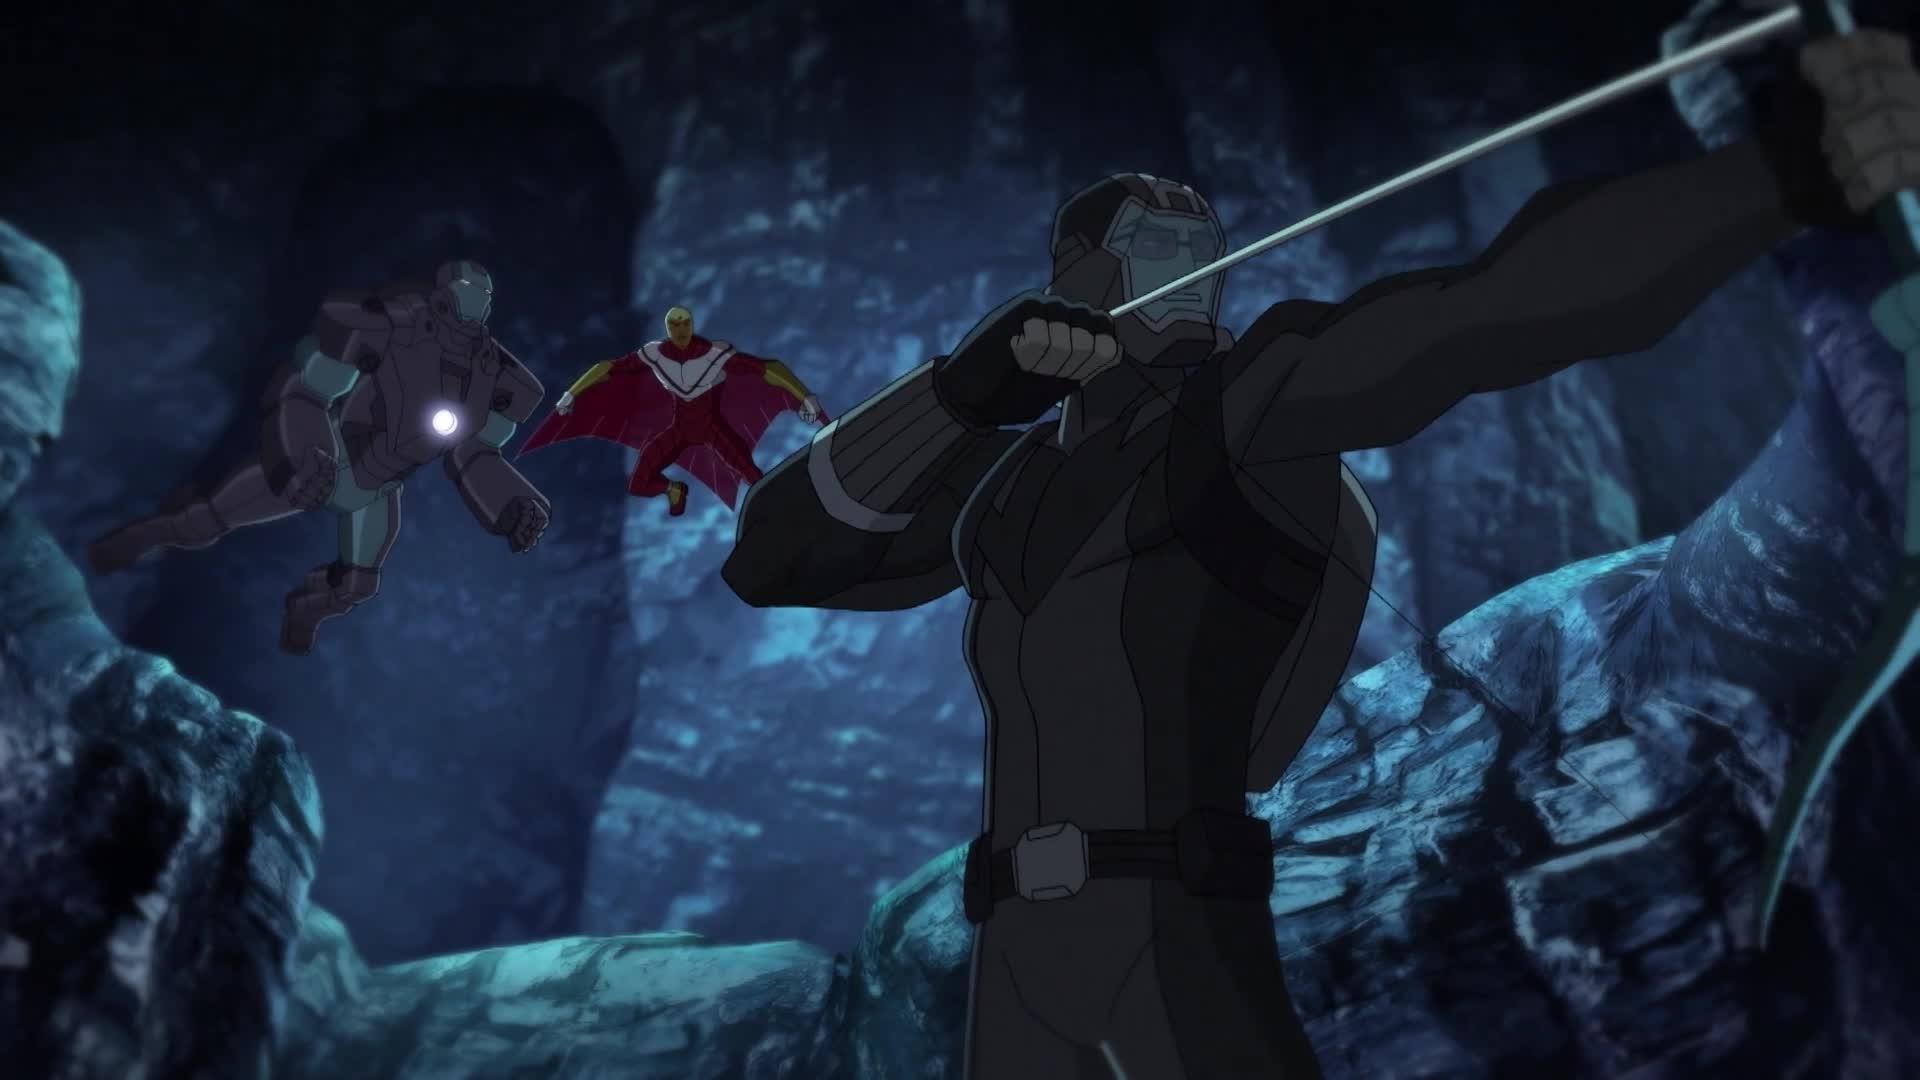 Avengers Assemble - Onderwater gevecht